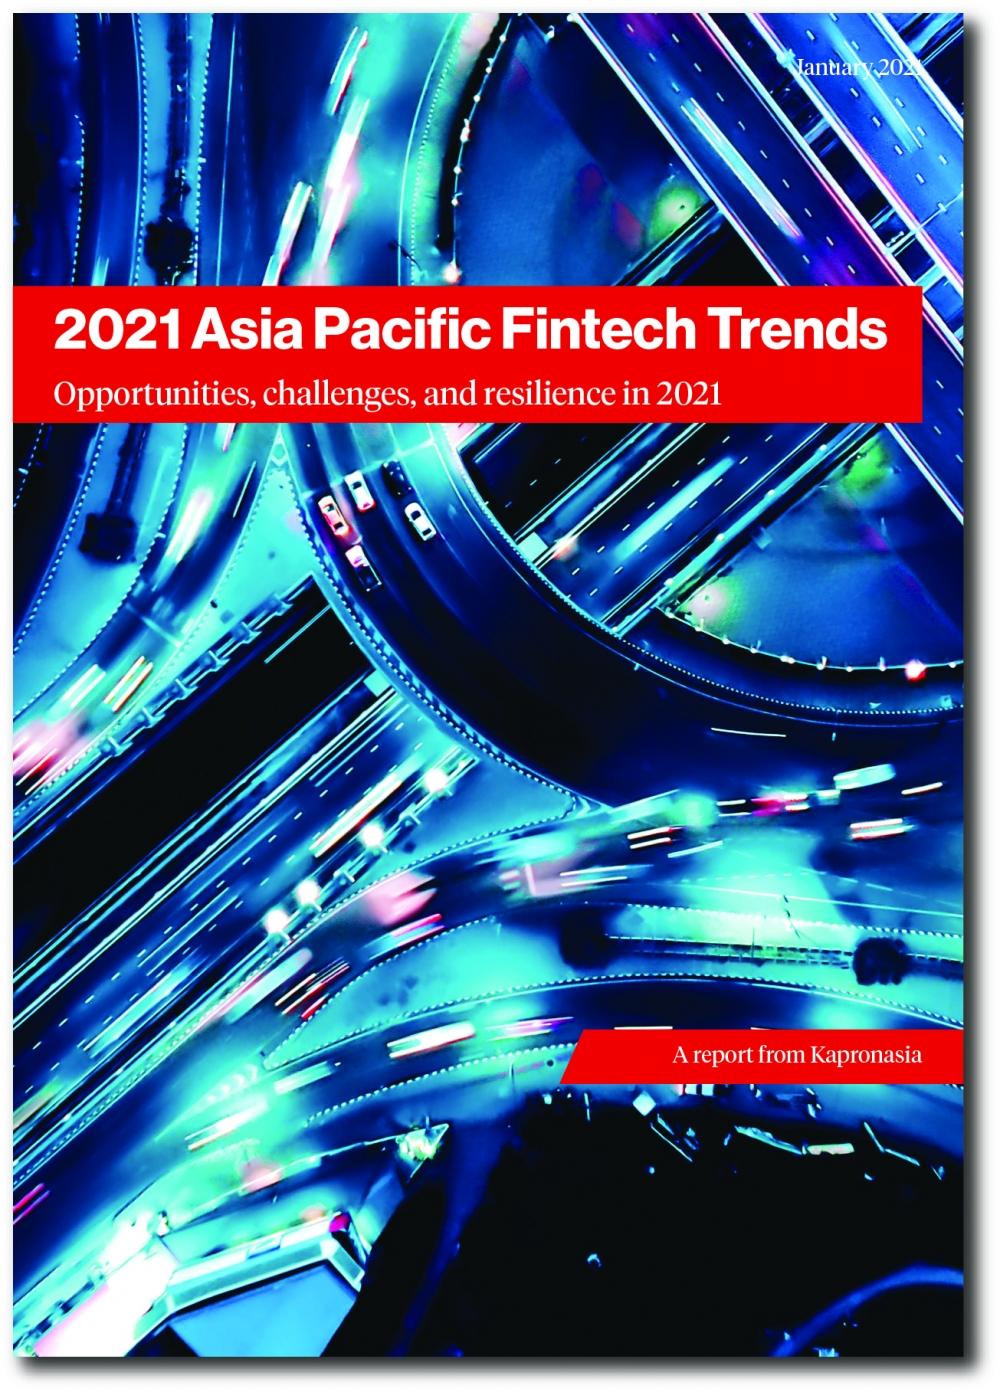 2021 Asia Pacific Fintech Trends - Kapronasia